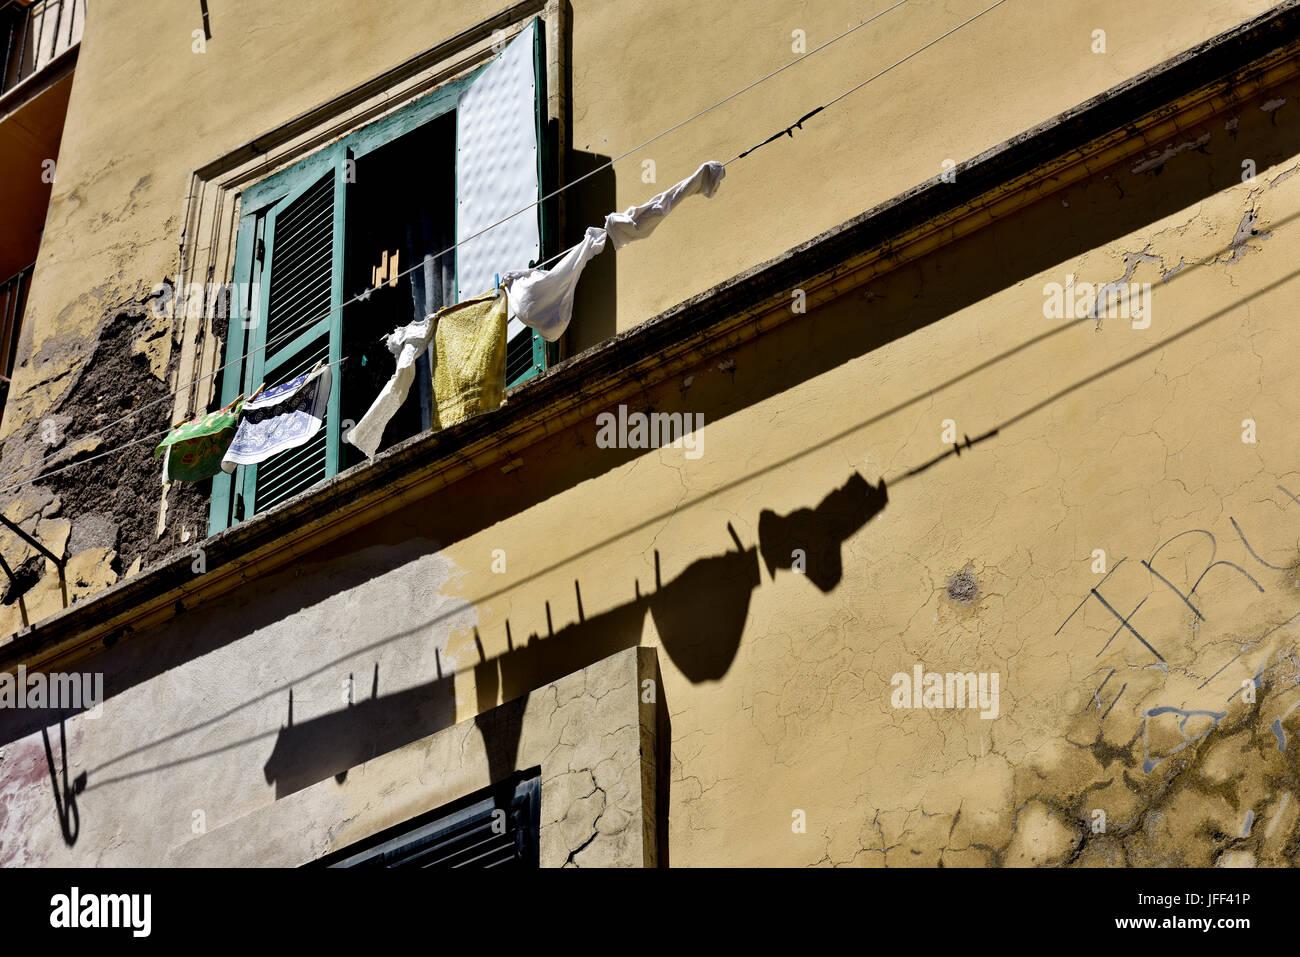 Wasche Hangen Aus Fenster Trocknen Schatten An Wand Stockfoto Bild